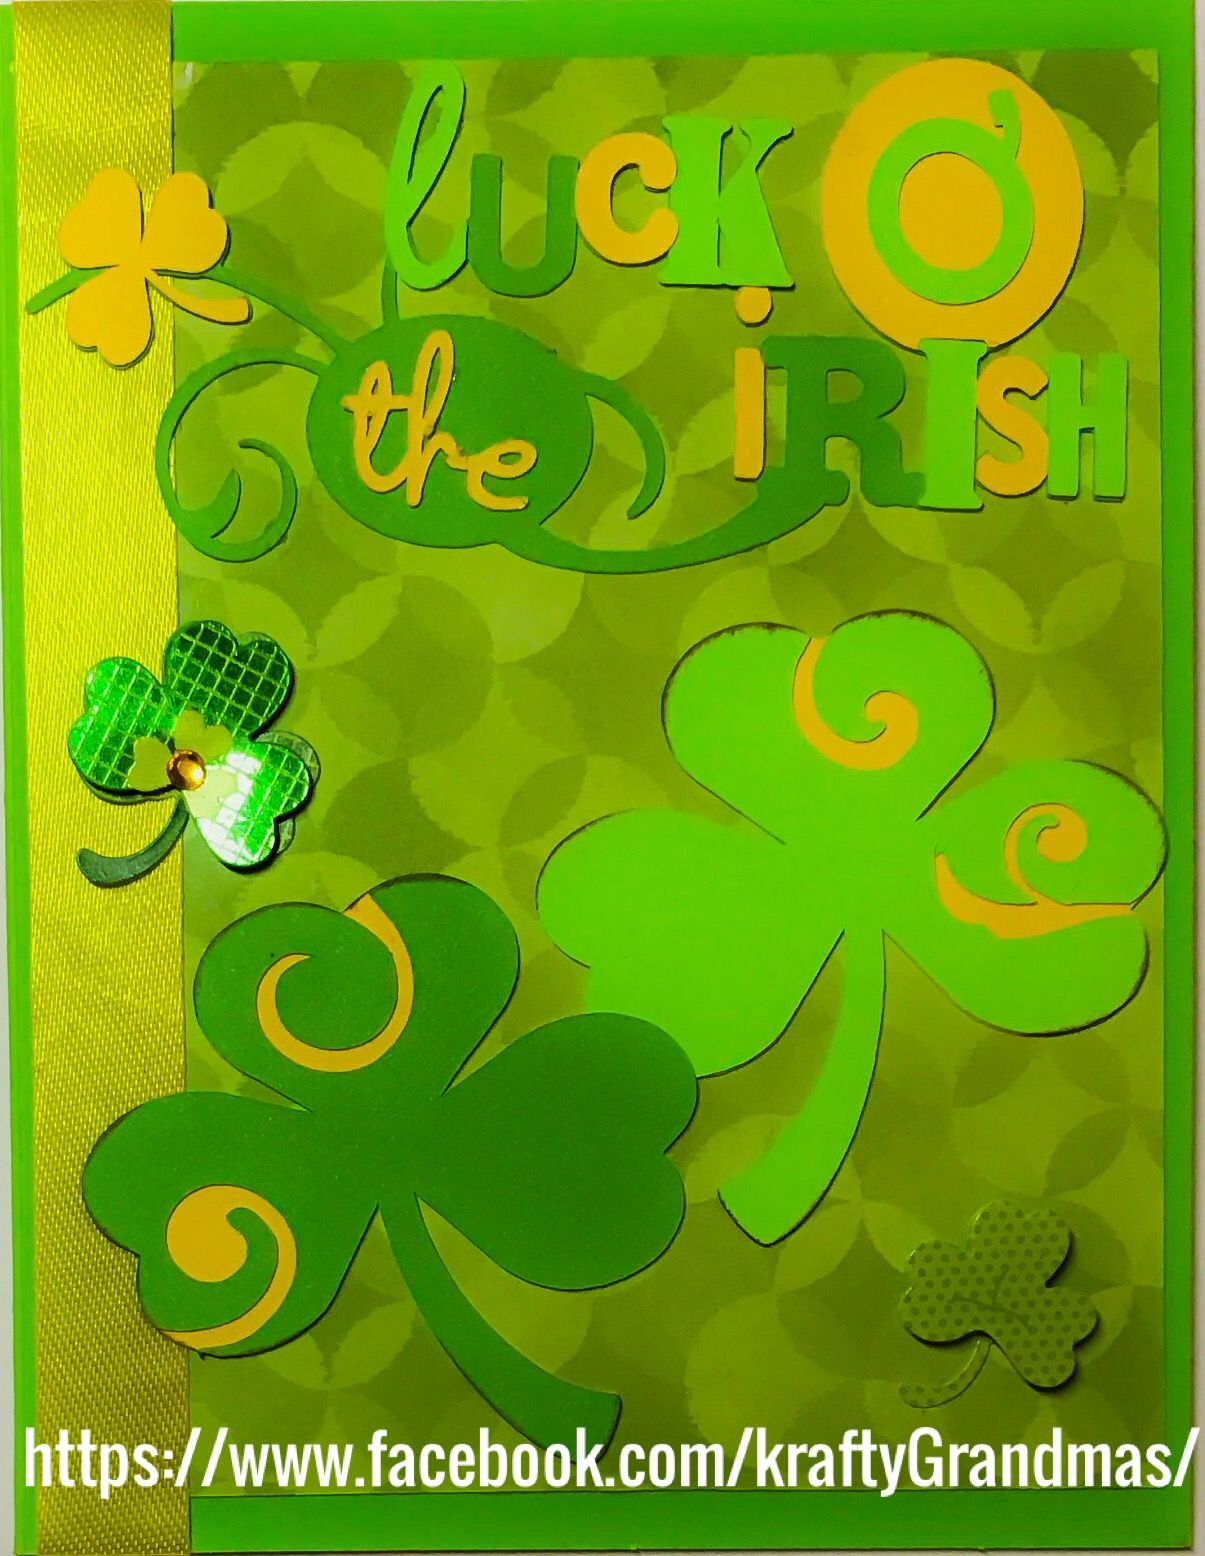 St. Patrick's day card-homemade using Cricut